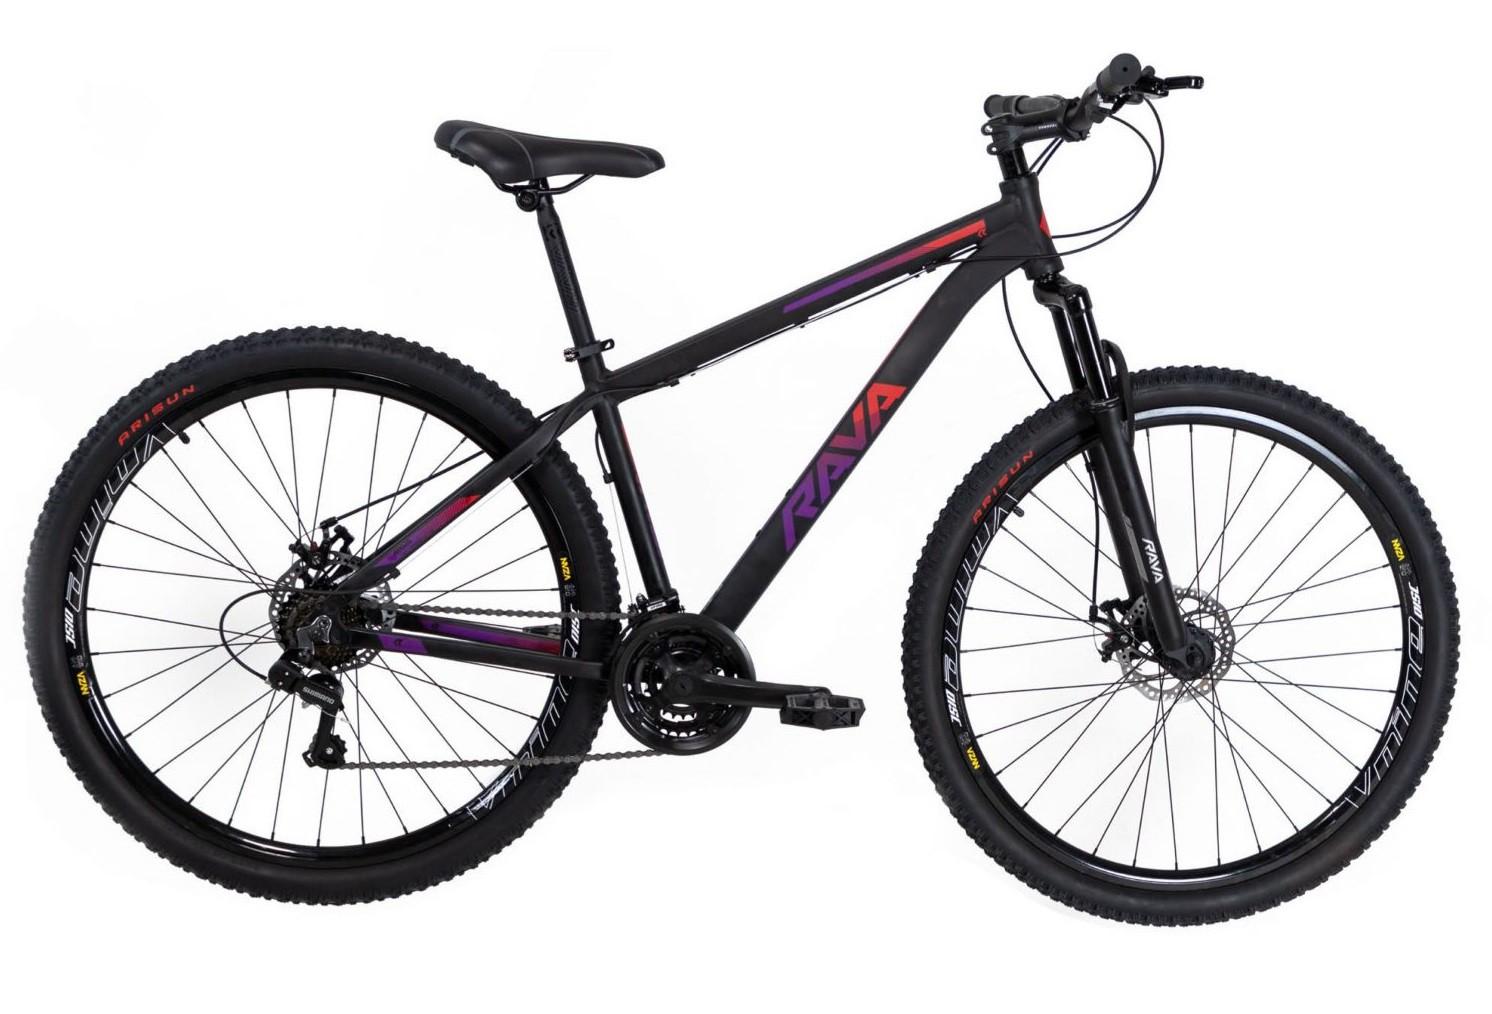 Bicicleta aro 29 Alumínio Rava Pressure  21 velocidades